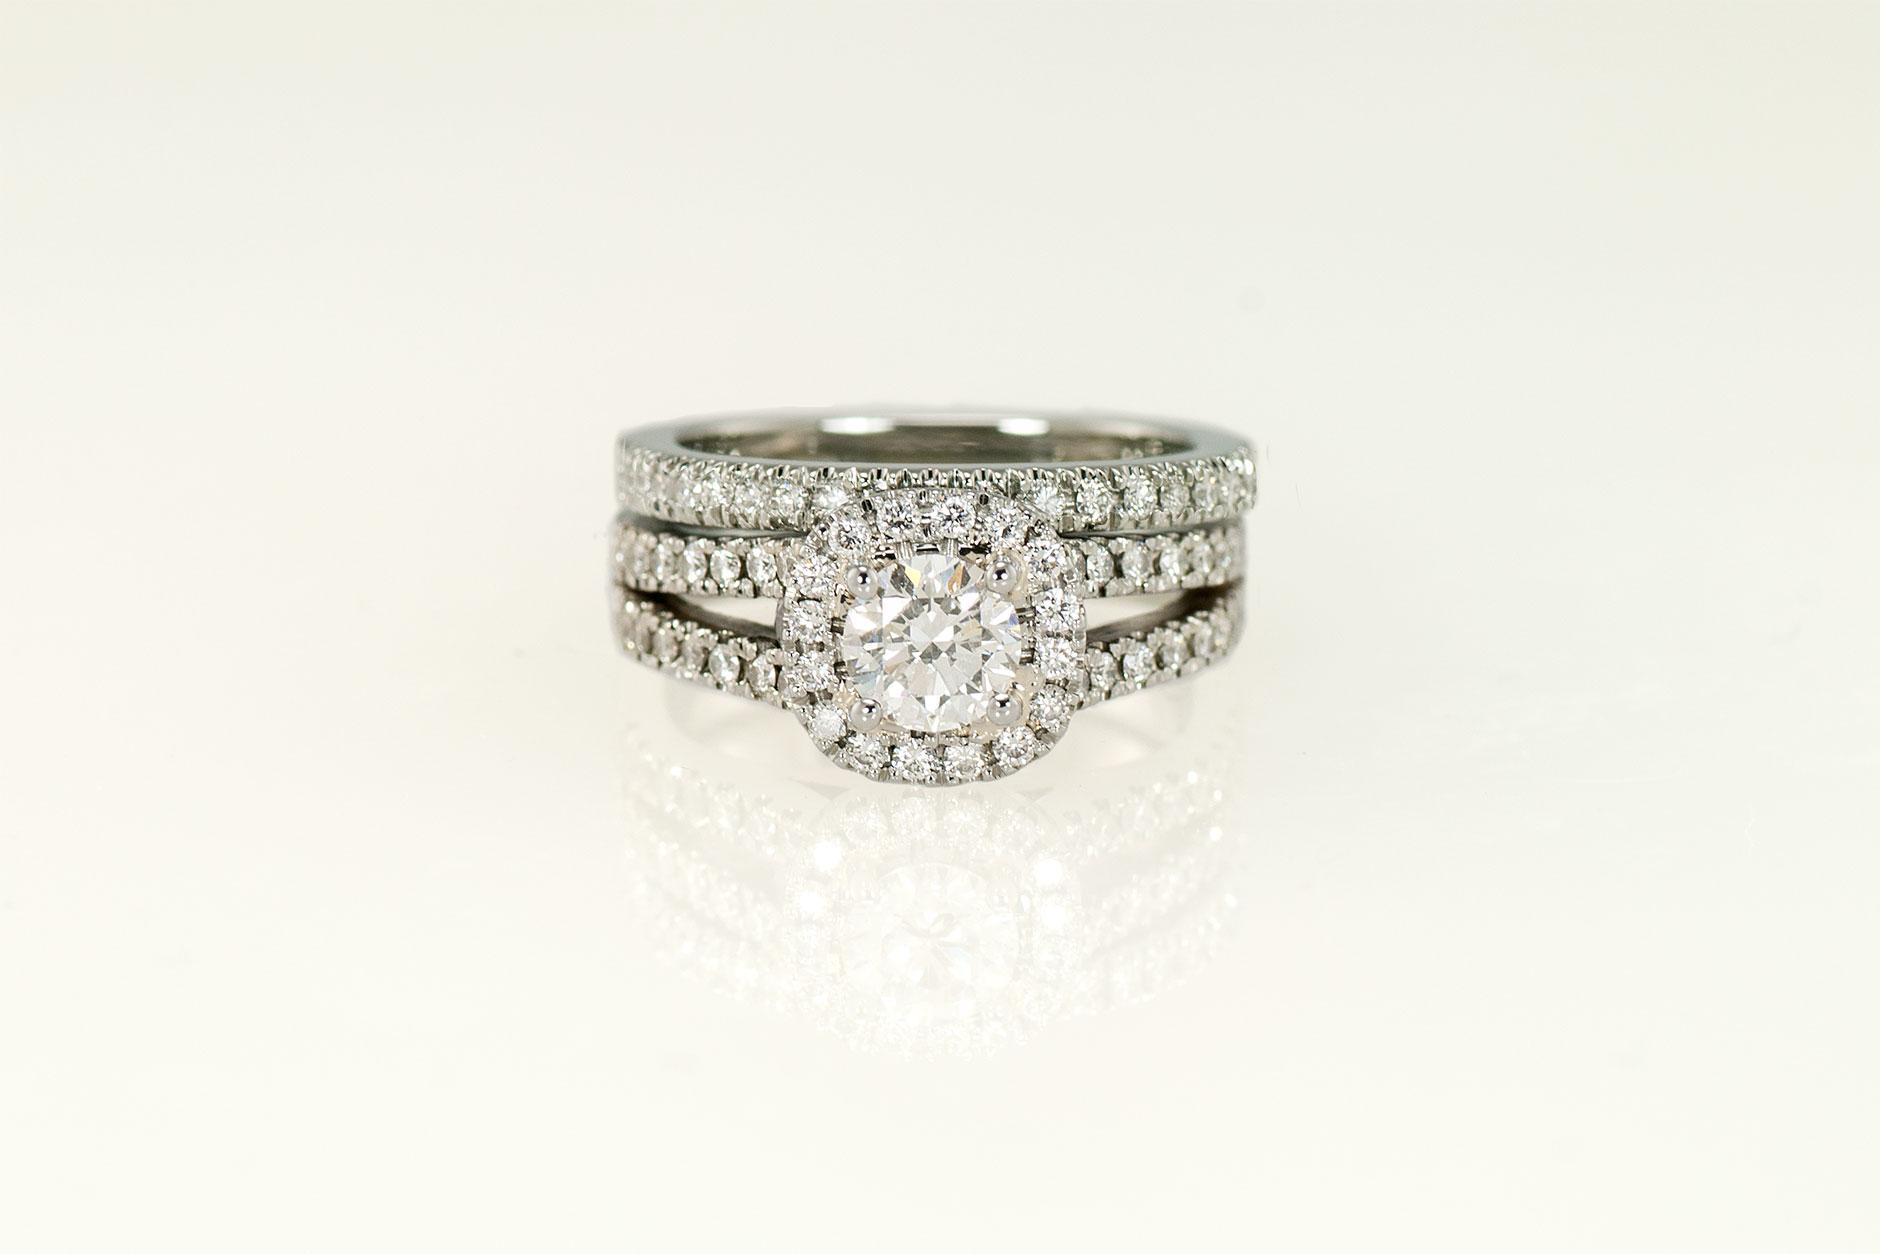 Soft Square 19k White Gold Halo Ring & Matching Micro Pave Wedding Band - NEWA Goldsmith